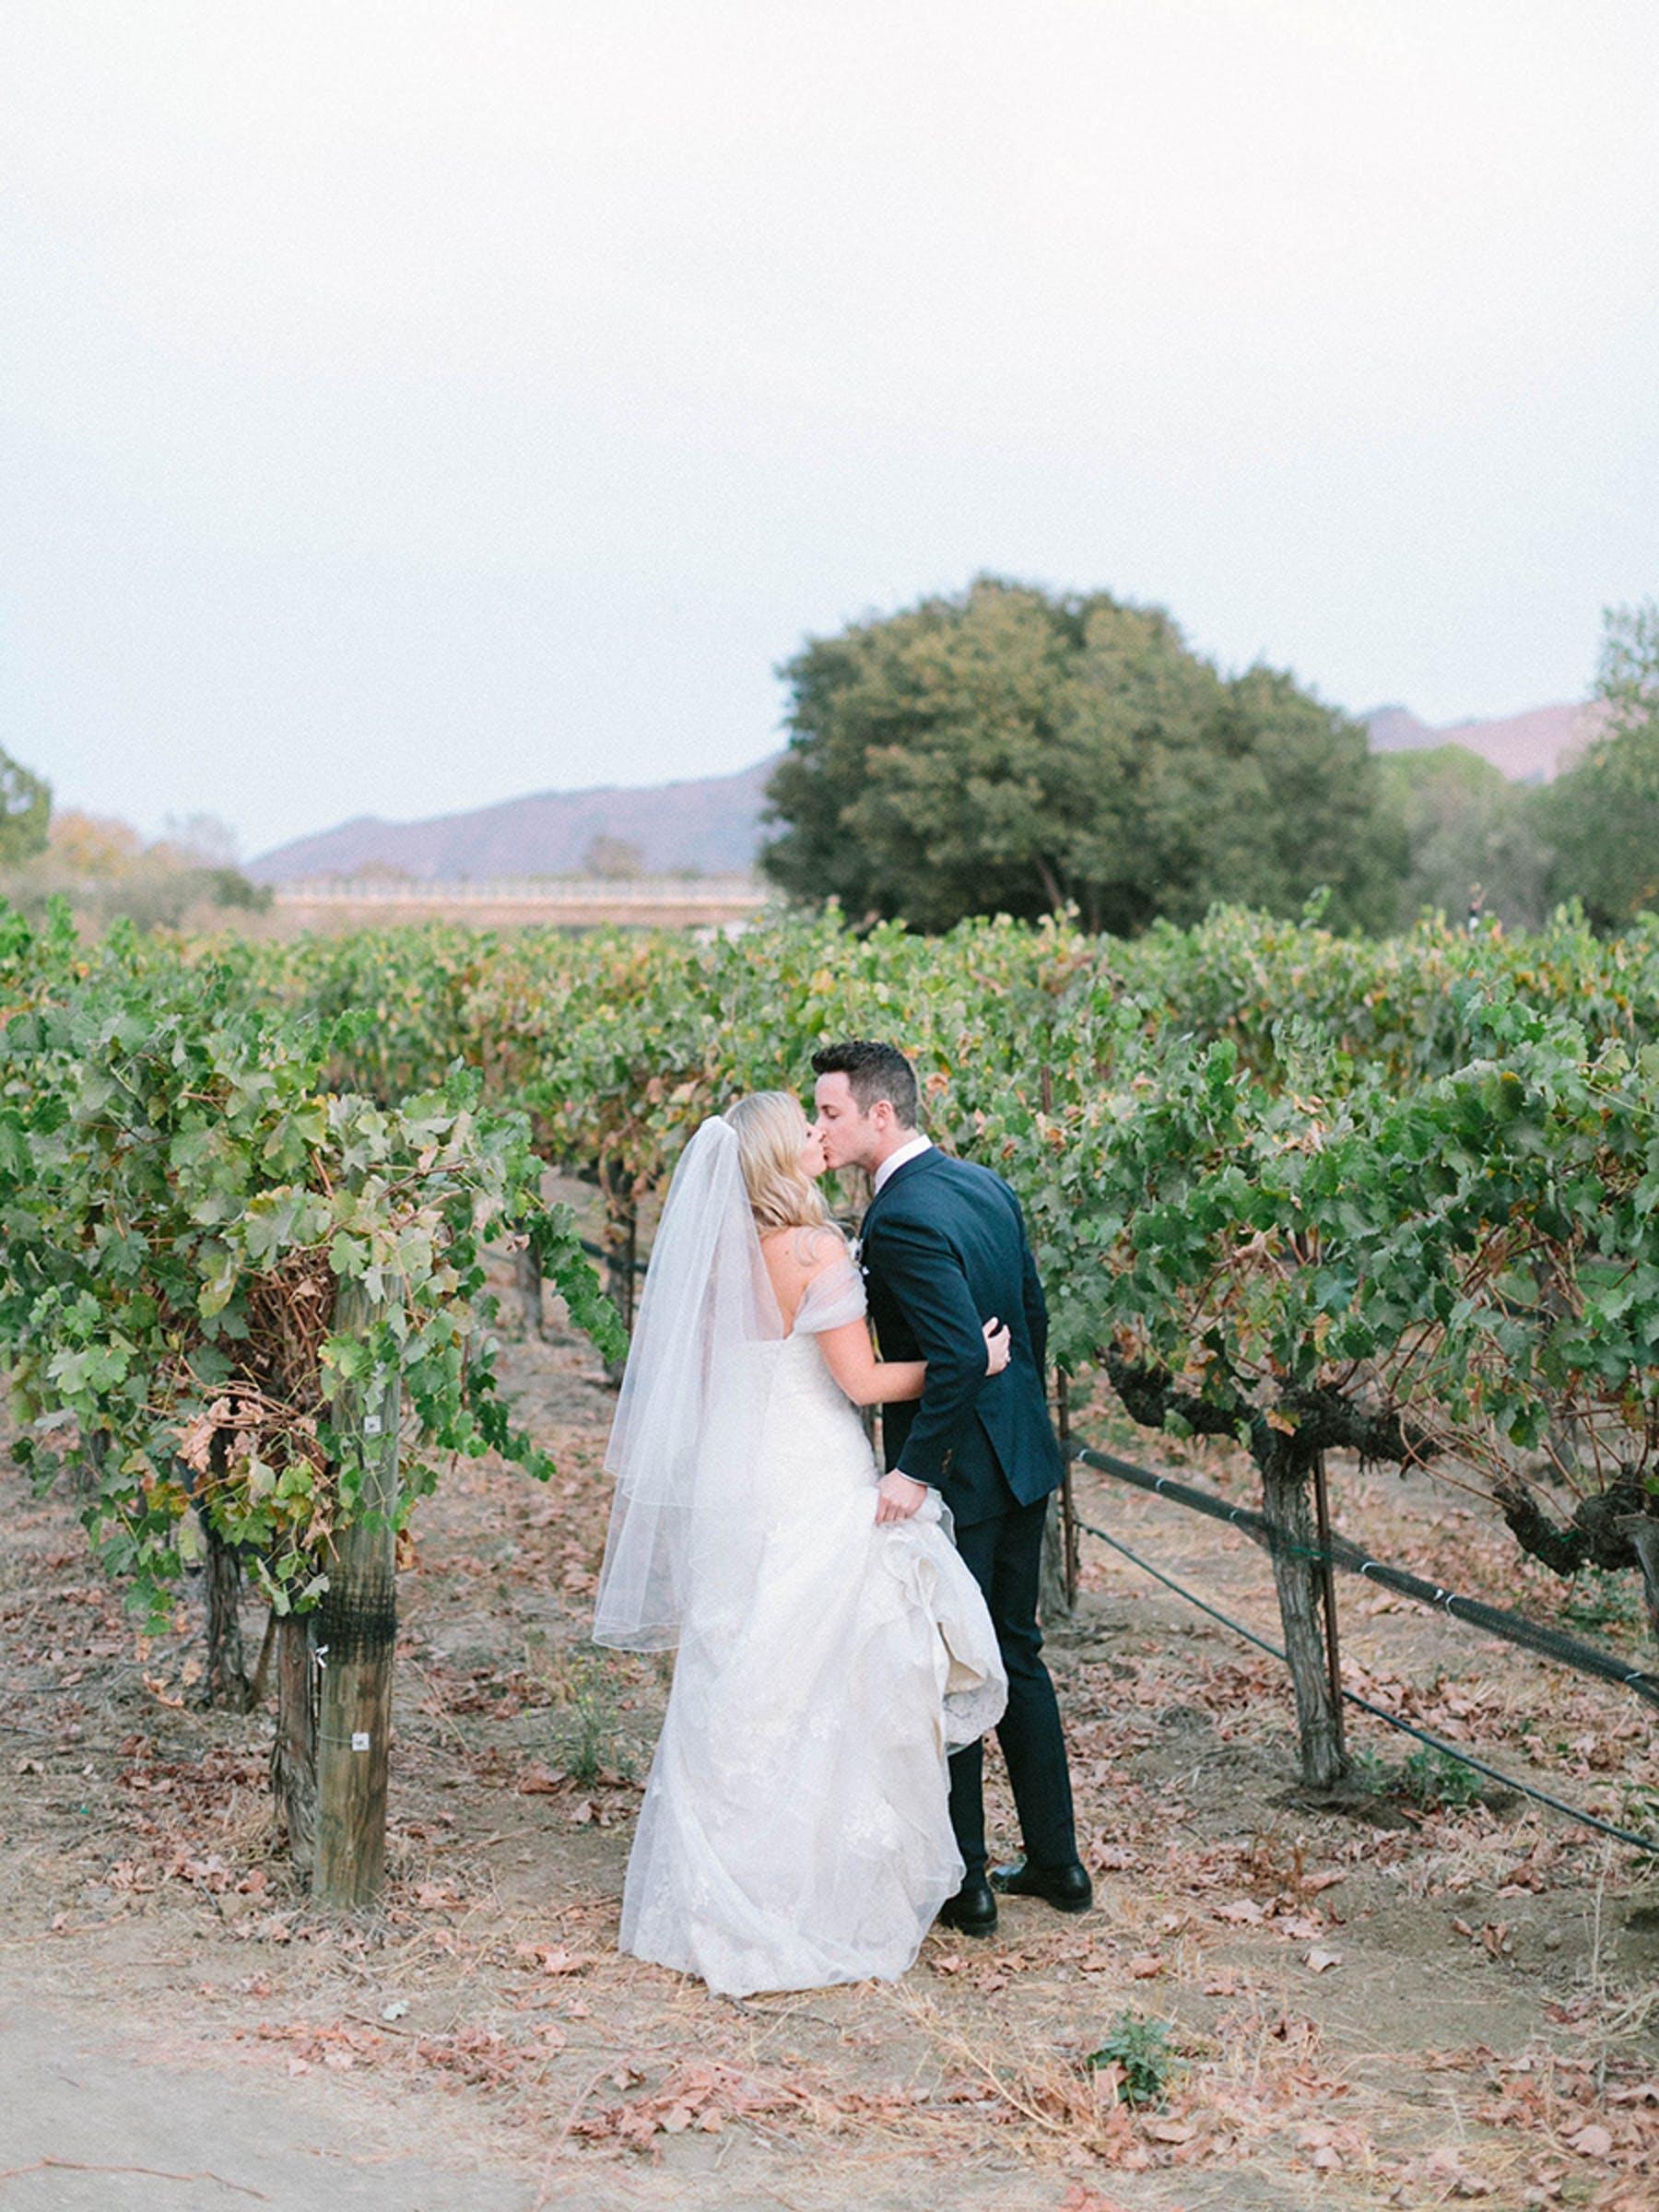 www.santabarbarawedding.com | Sunstone Winery | Luna de Mare | Esoteric Events | Bride and Groom